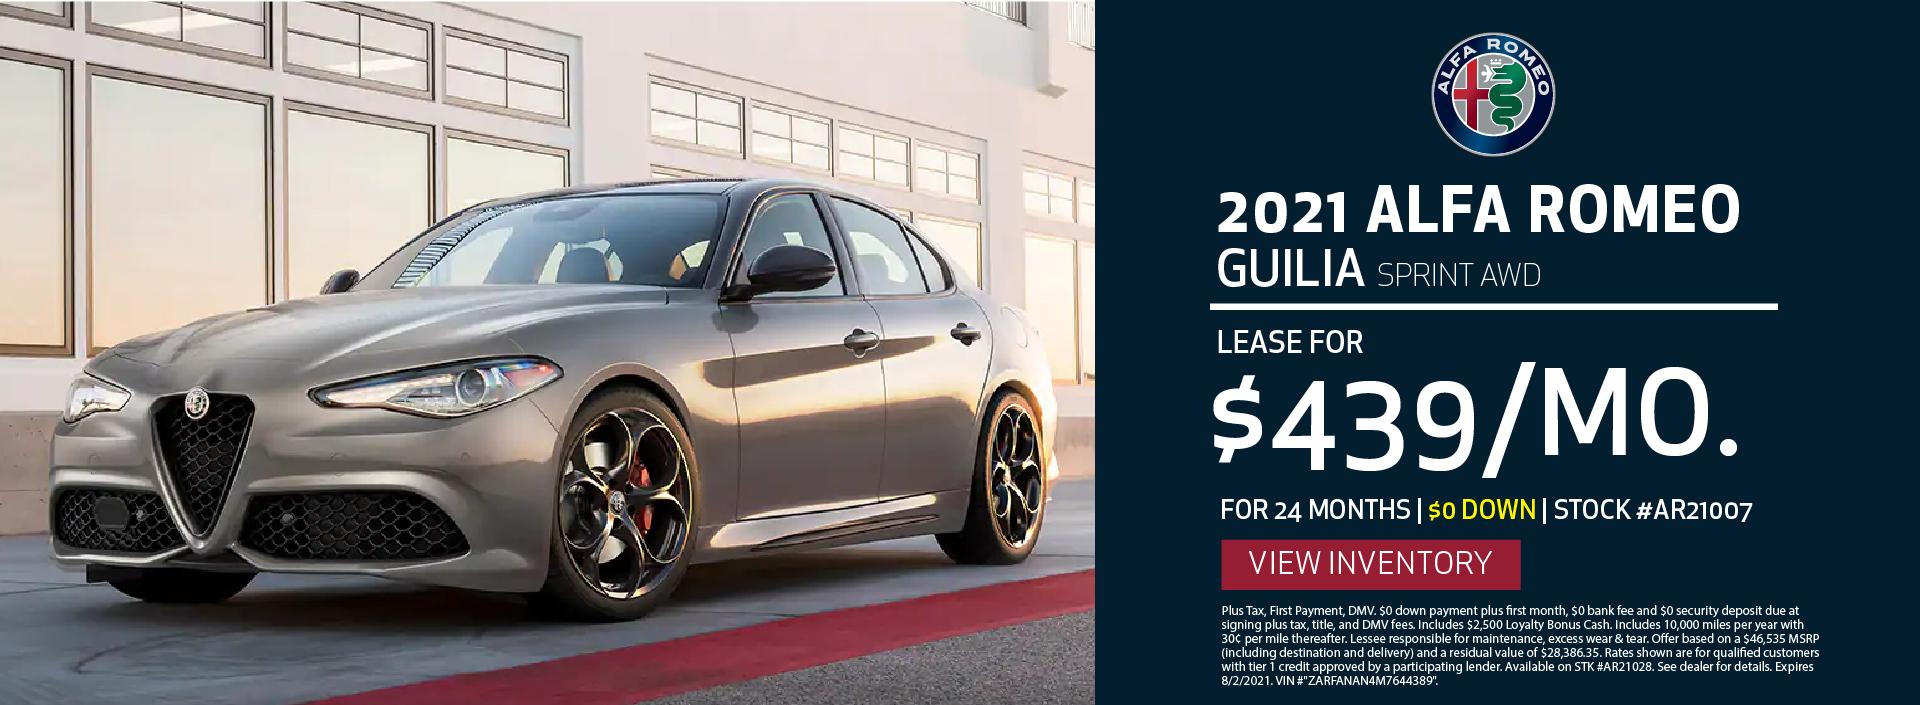 Manhattan Alfa Romeo – 2021 Guilia Sprint – July 2021